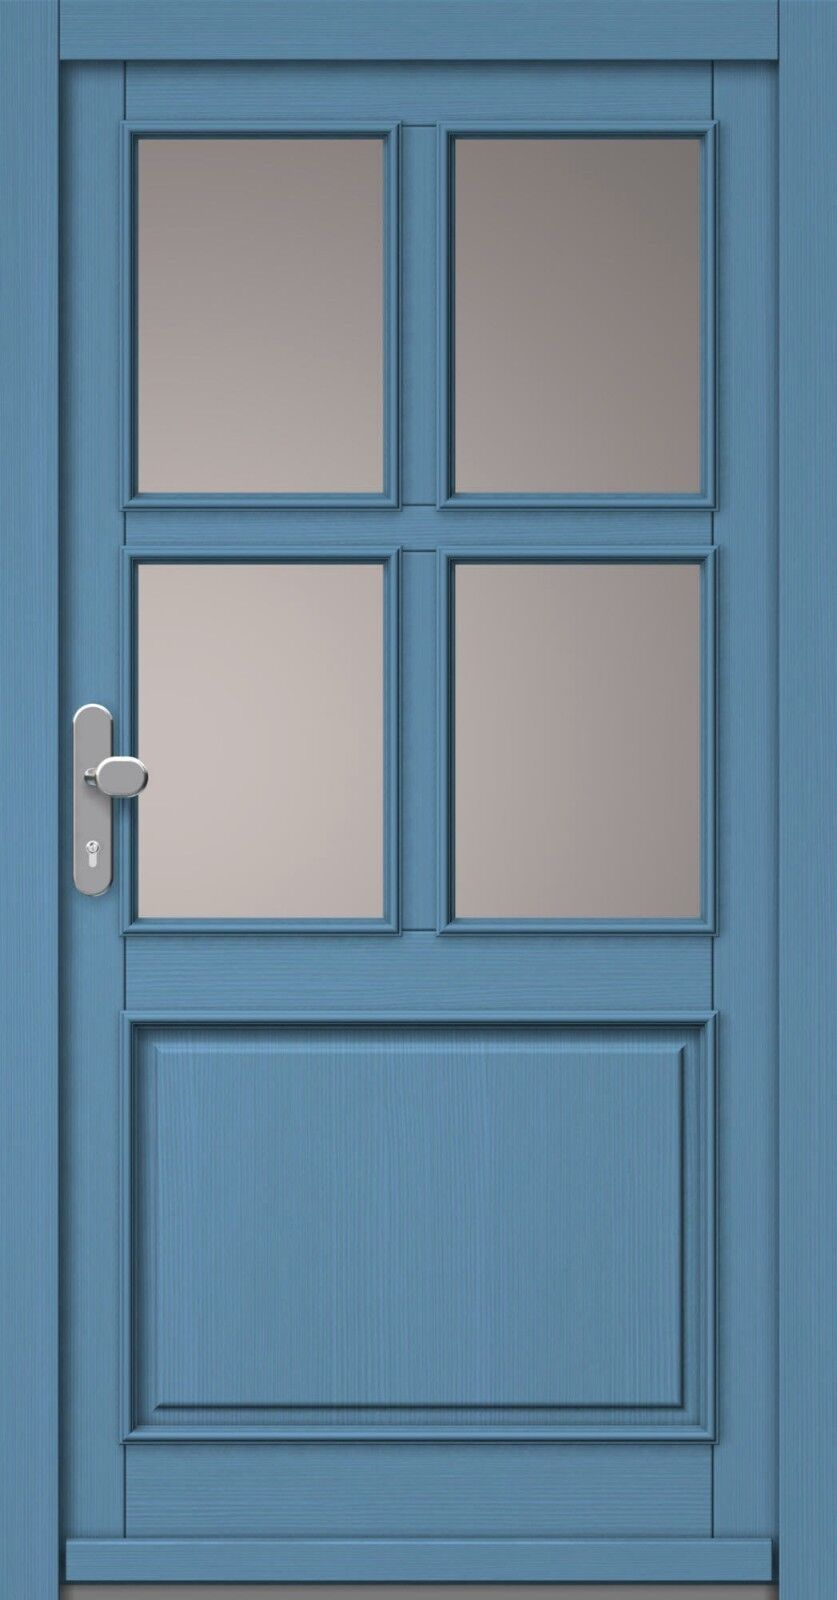 Haustür Haustüre Haustüren Holz Fichte Holztür Eingangstür Bautiefe 68 mm Neu